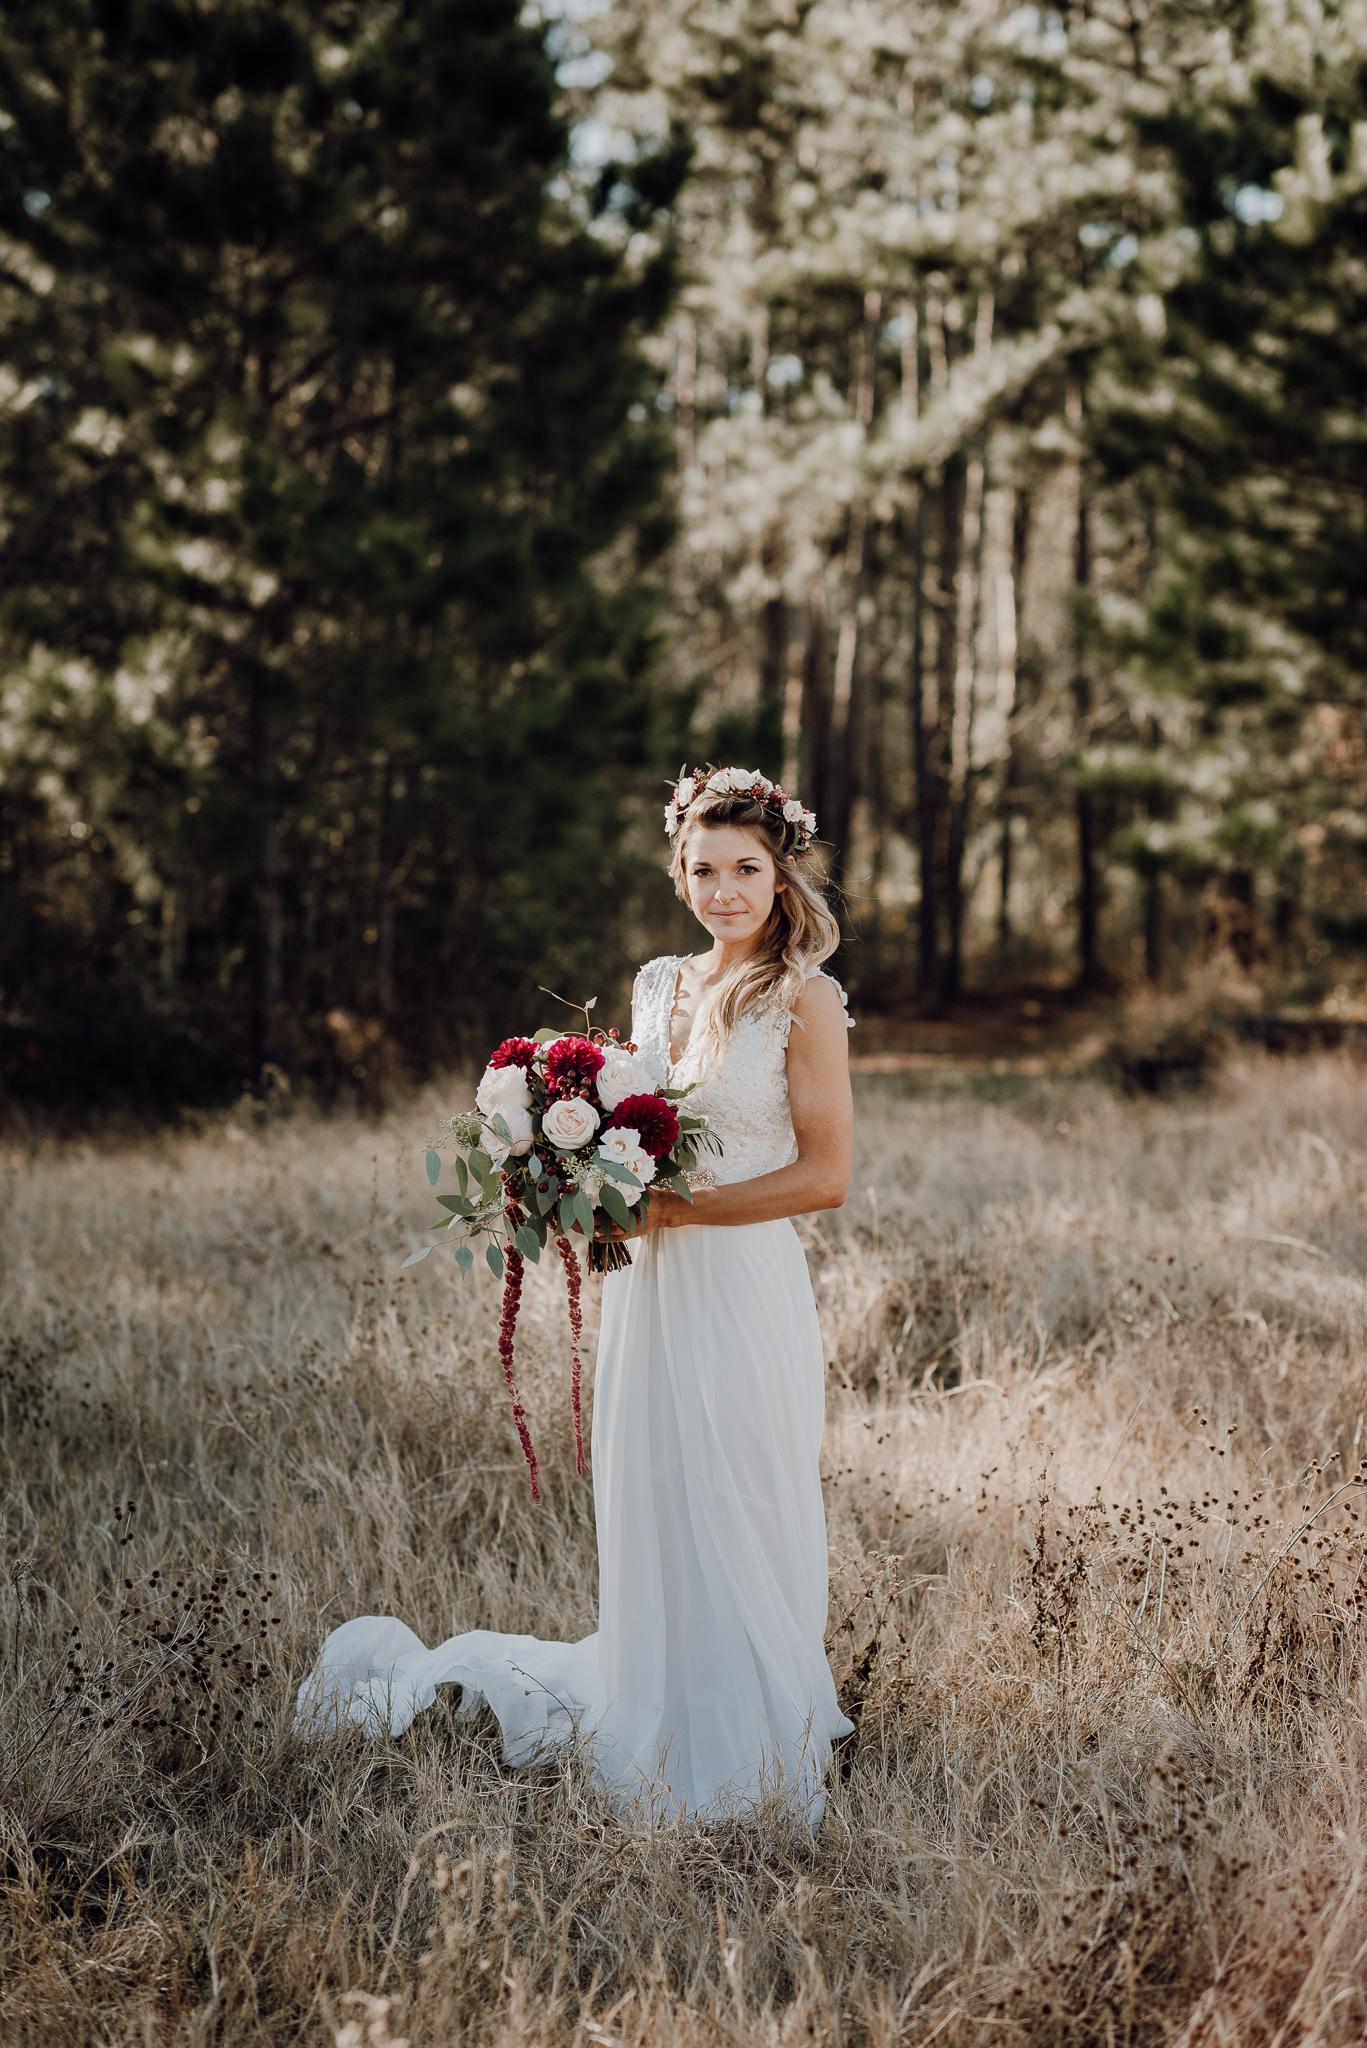 Michelle + Aron-Houston Wedding Photographer-Magnolia Meadows-Winter Wedding | Kristen Giles Photography - 020.jpg